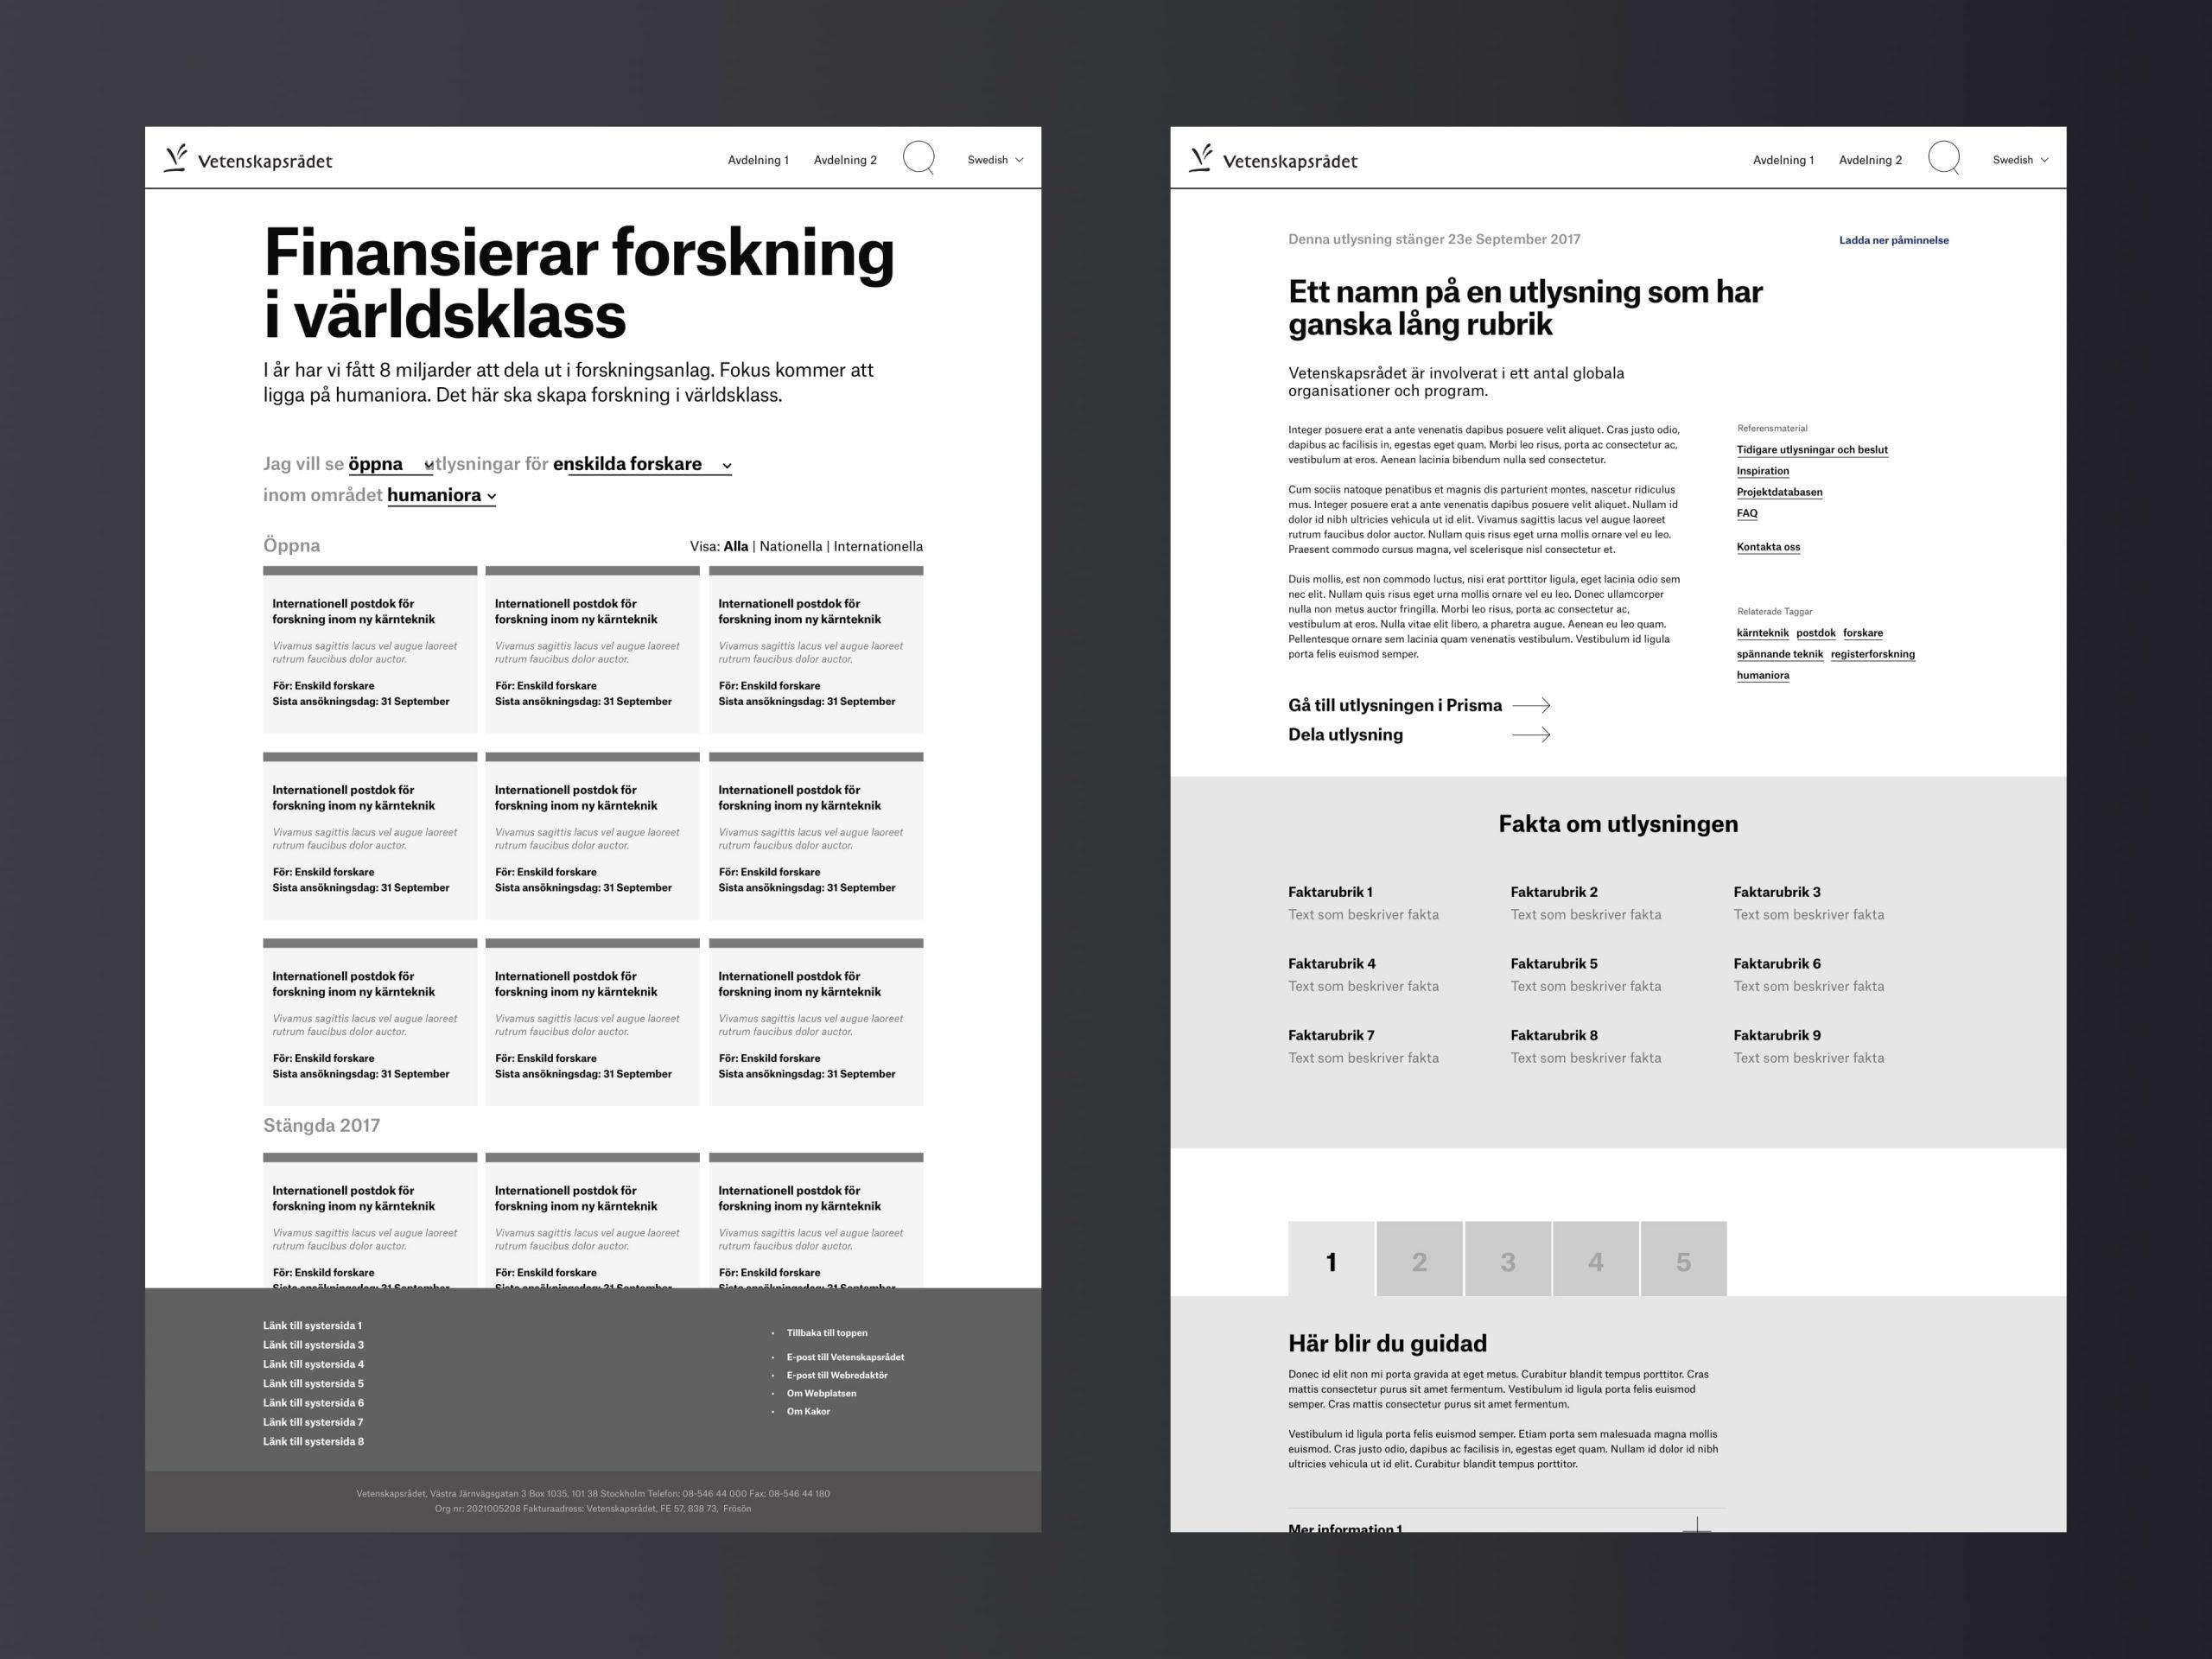 Wireframes done for Vetenskapsrådet page types